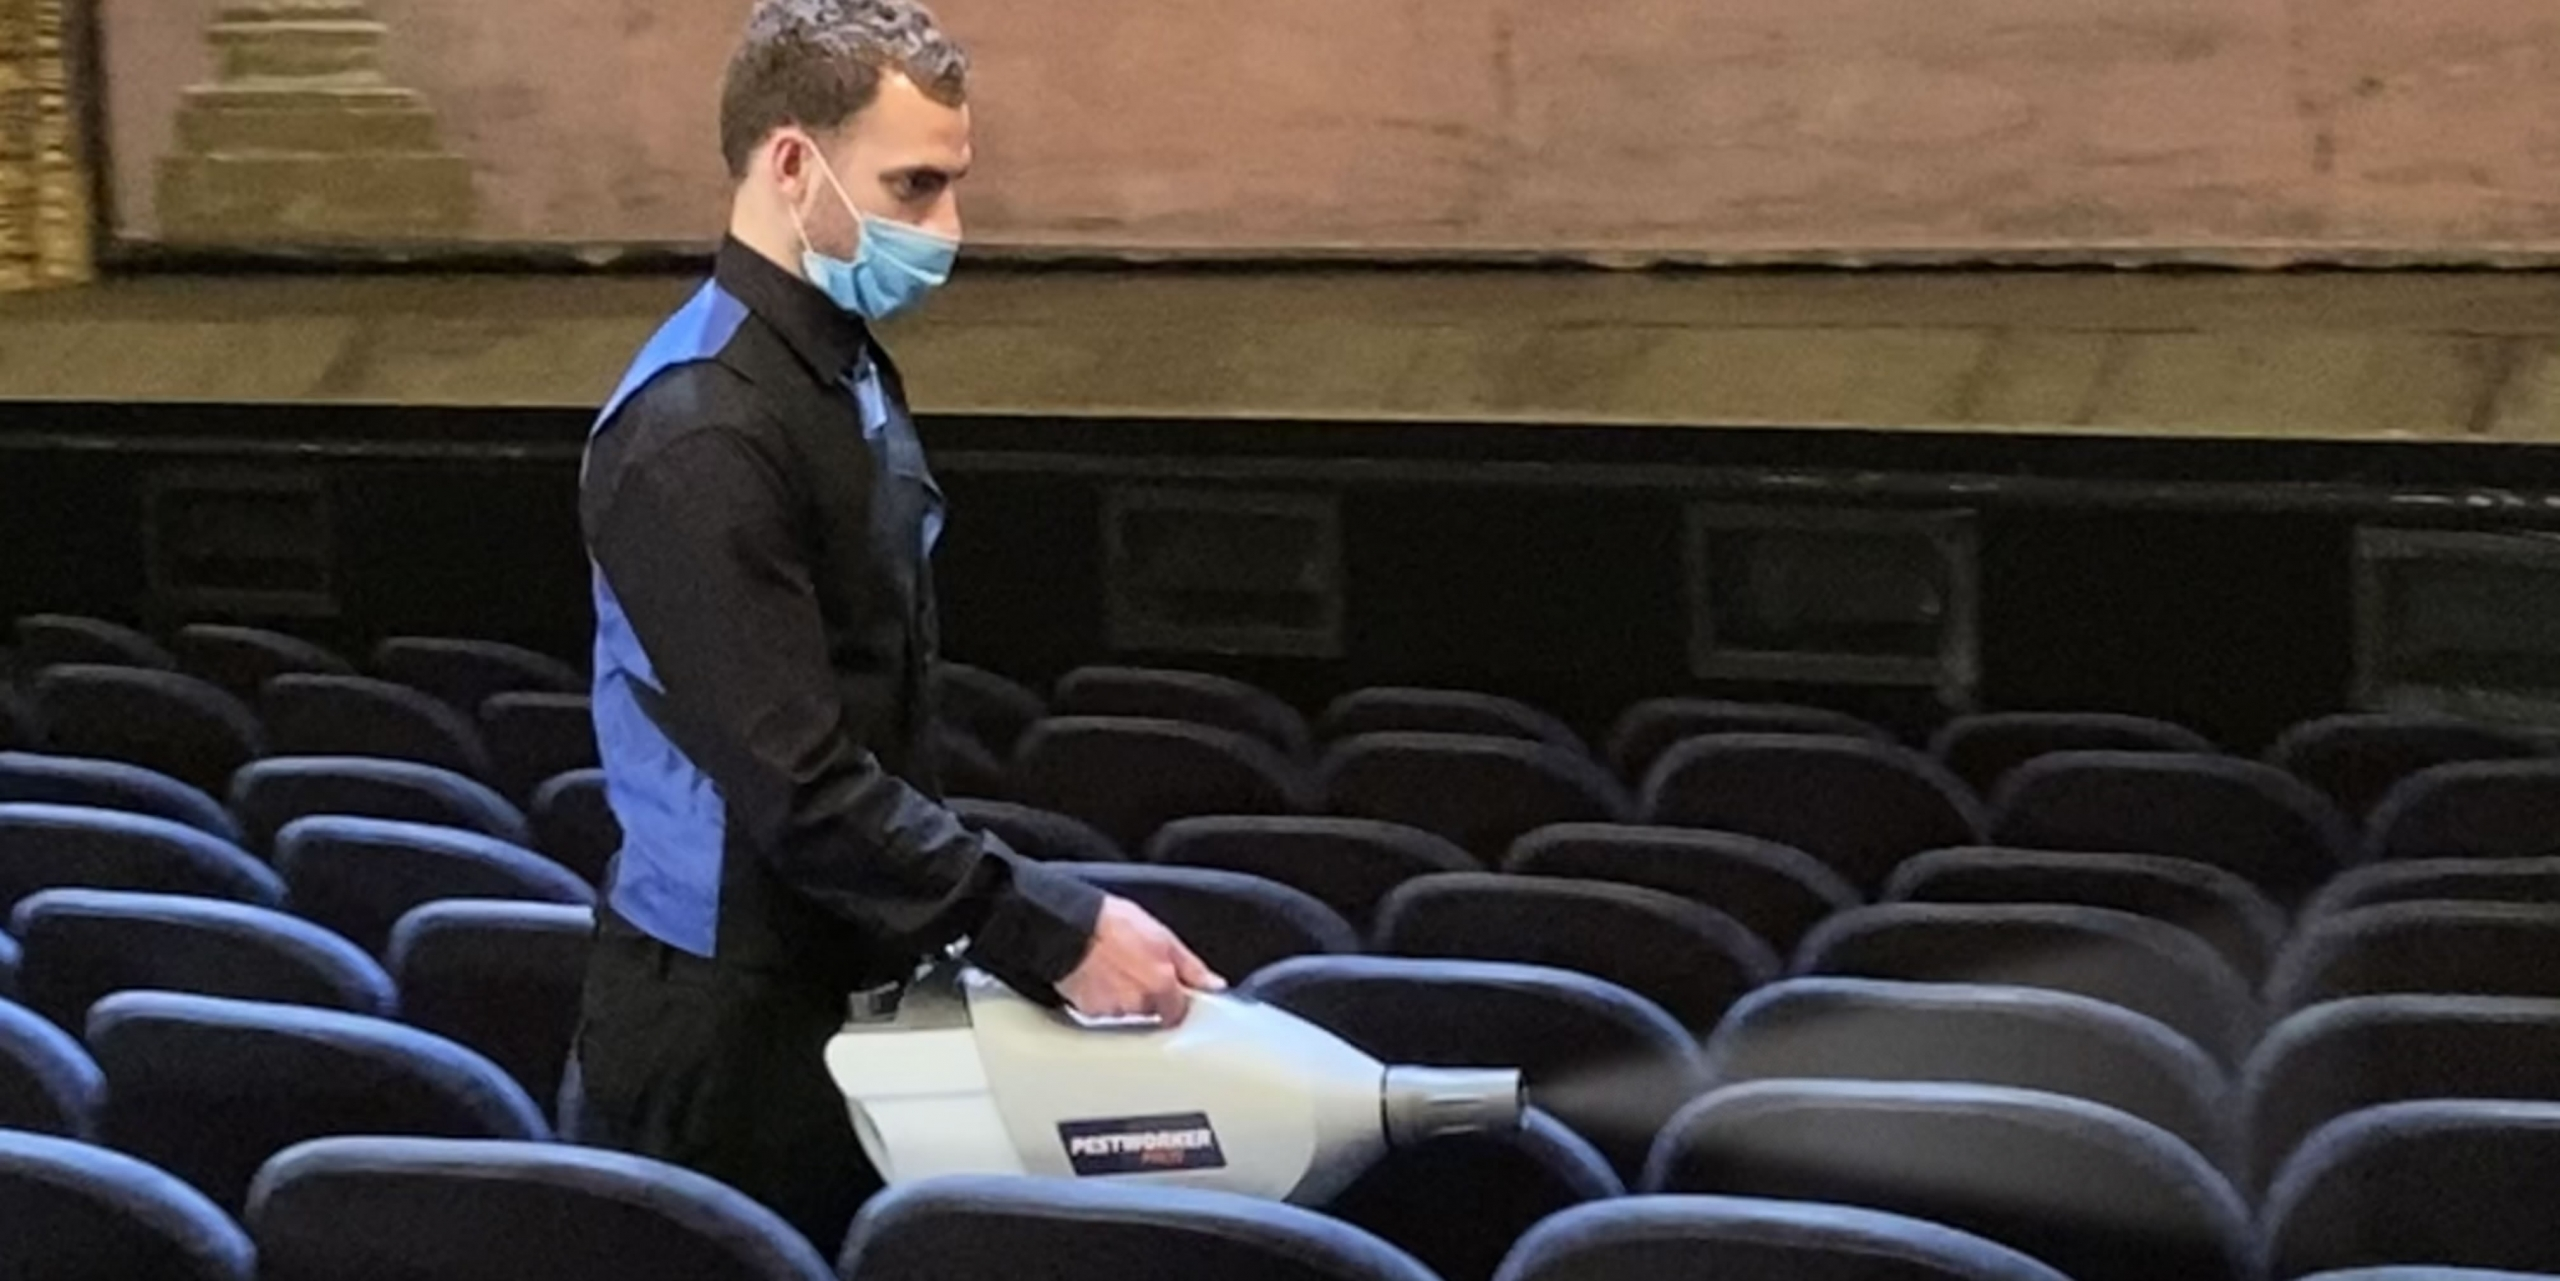 Fogging theatre with disinfectant